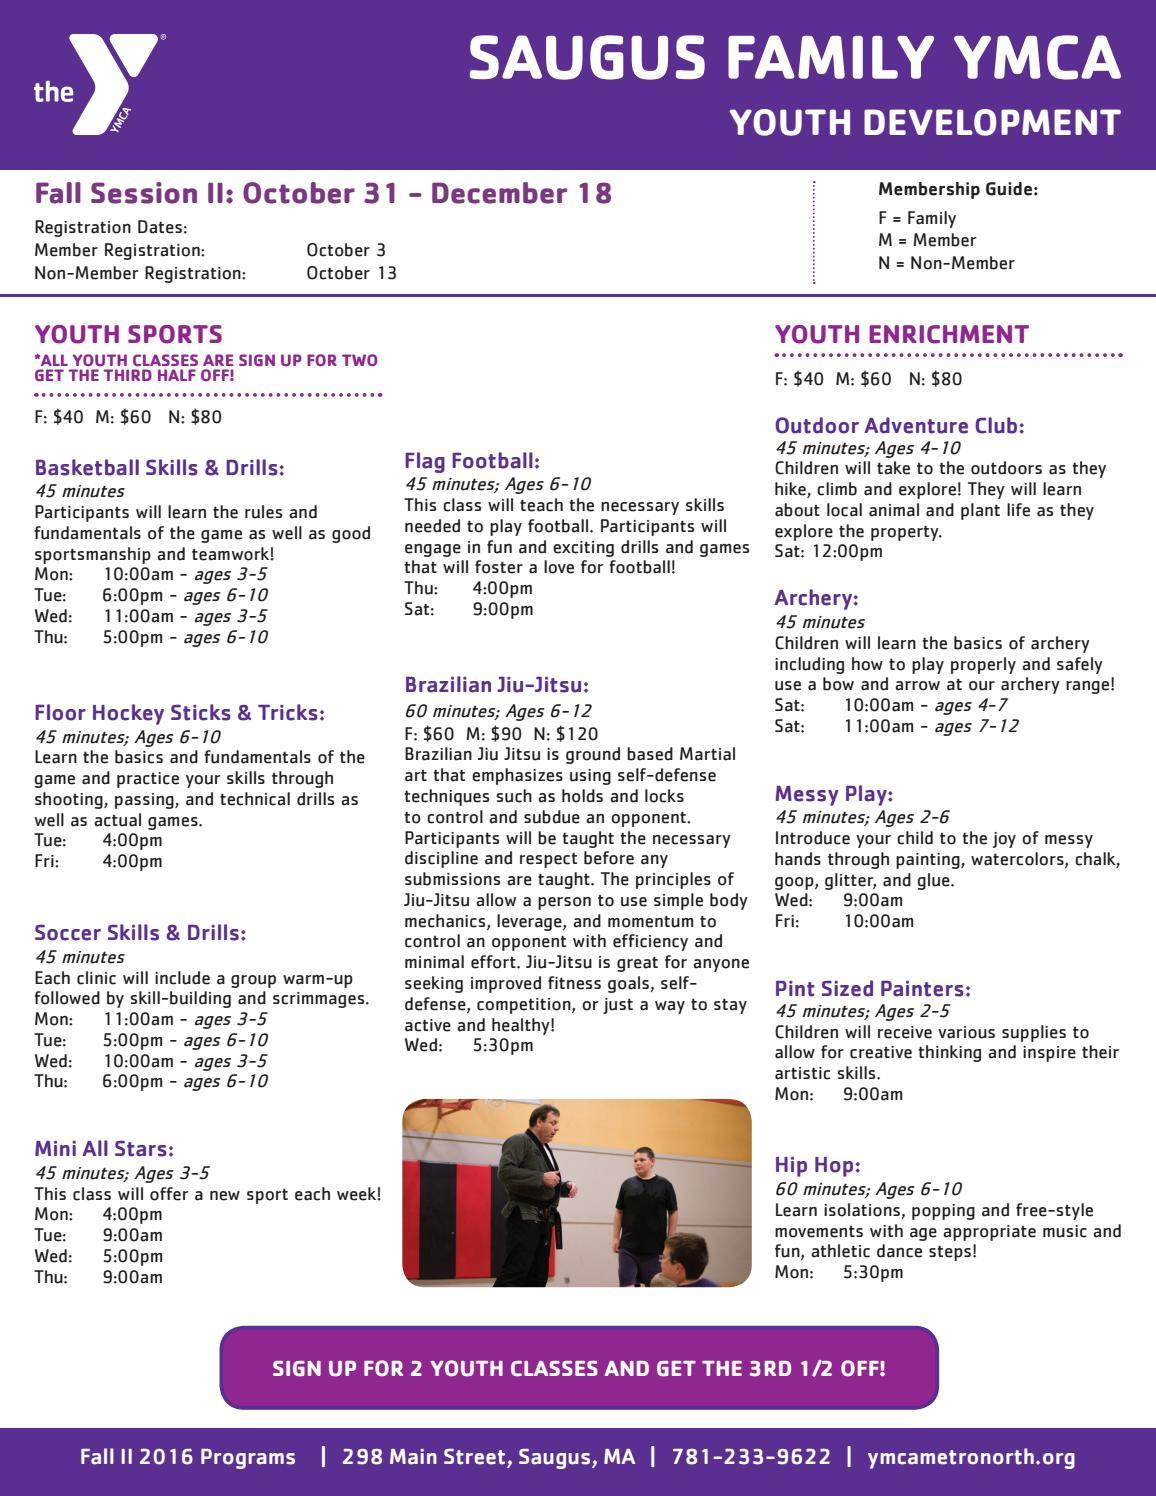 Saugus Fall II Programs by YMCA of Metro North - issuu